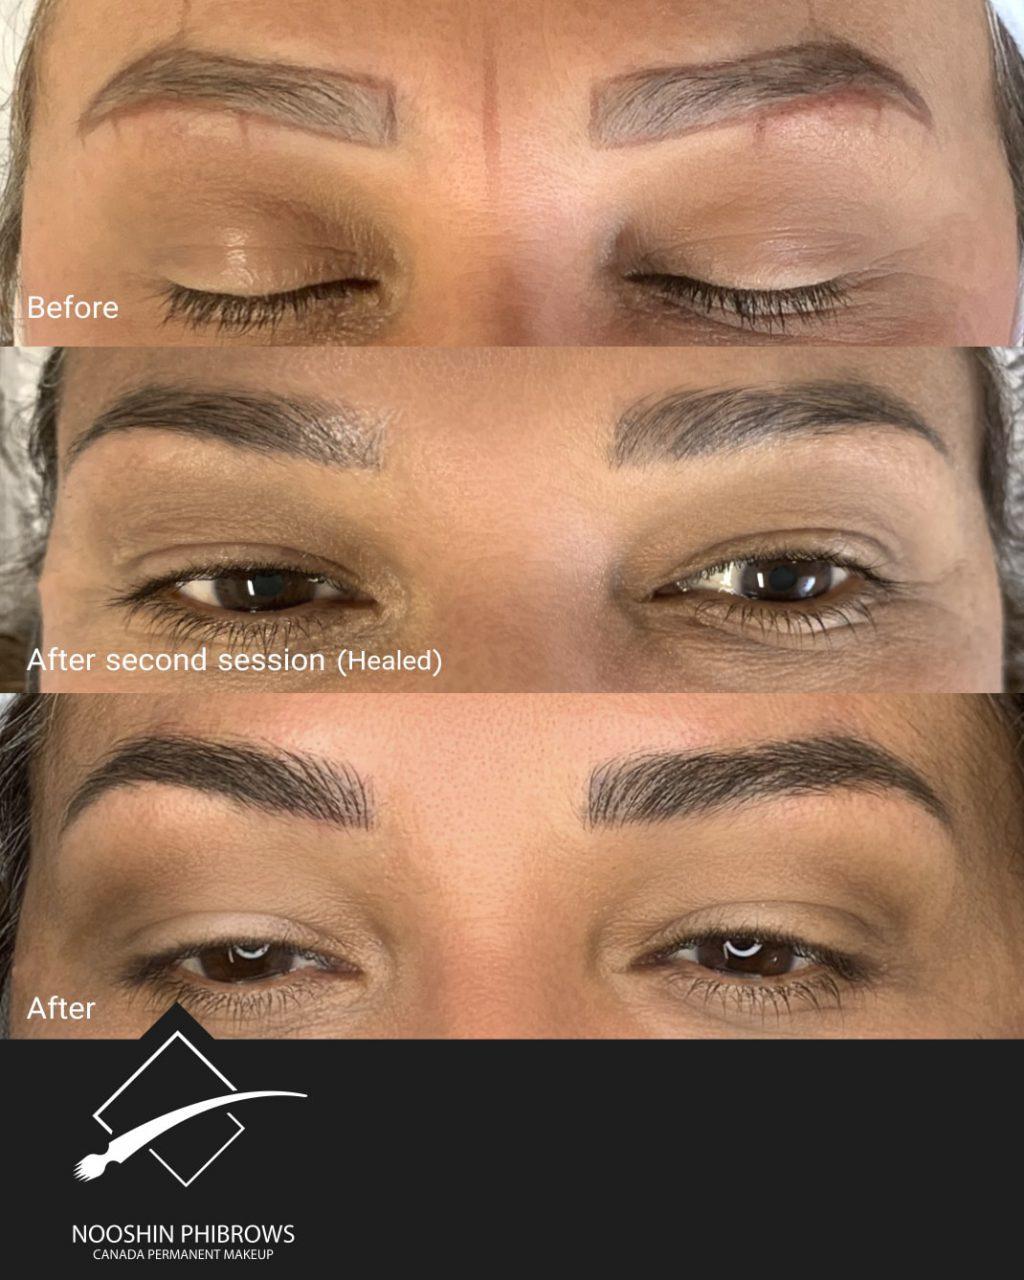 PHIBROWS PIGMENT SUP BROWN 2+3 (CODE: MB11) – Canada Makeup – IMG 5530 min – Canada Makeup – NOOSHIN JAVAHERIAN